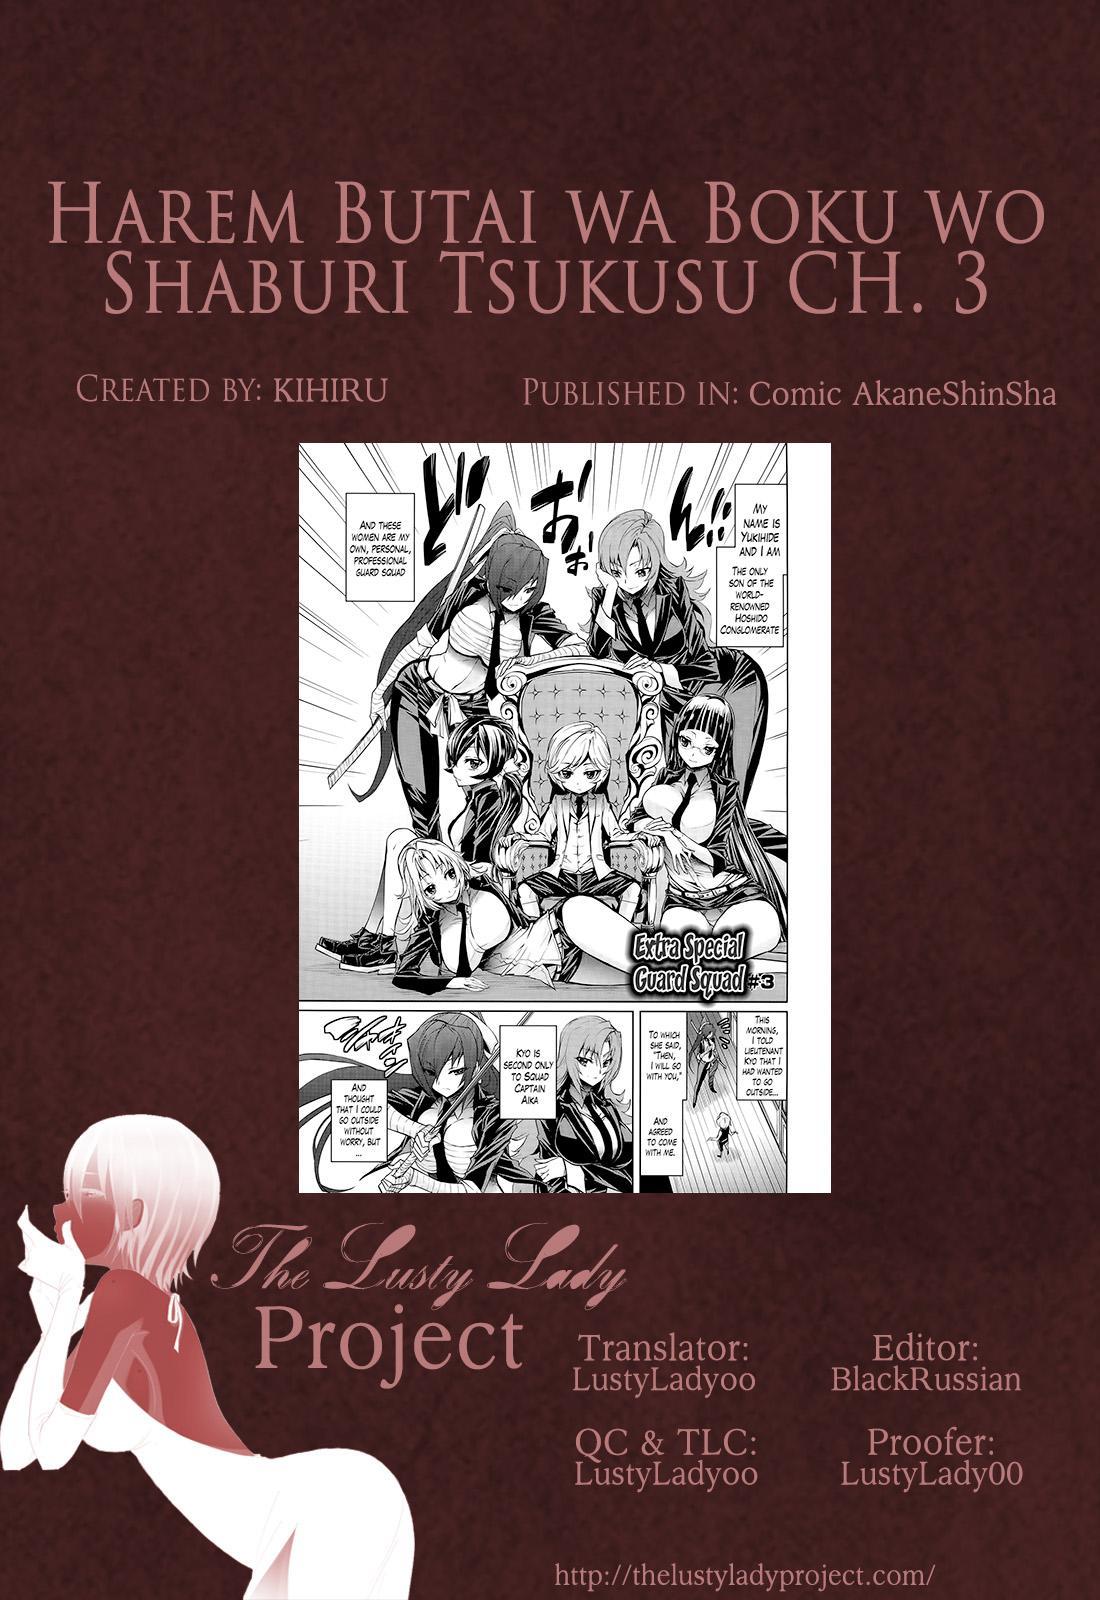 Harem Butai wa Boku o Shaburi Tsukusu - Harem unit sucks all me 64